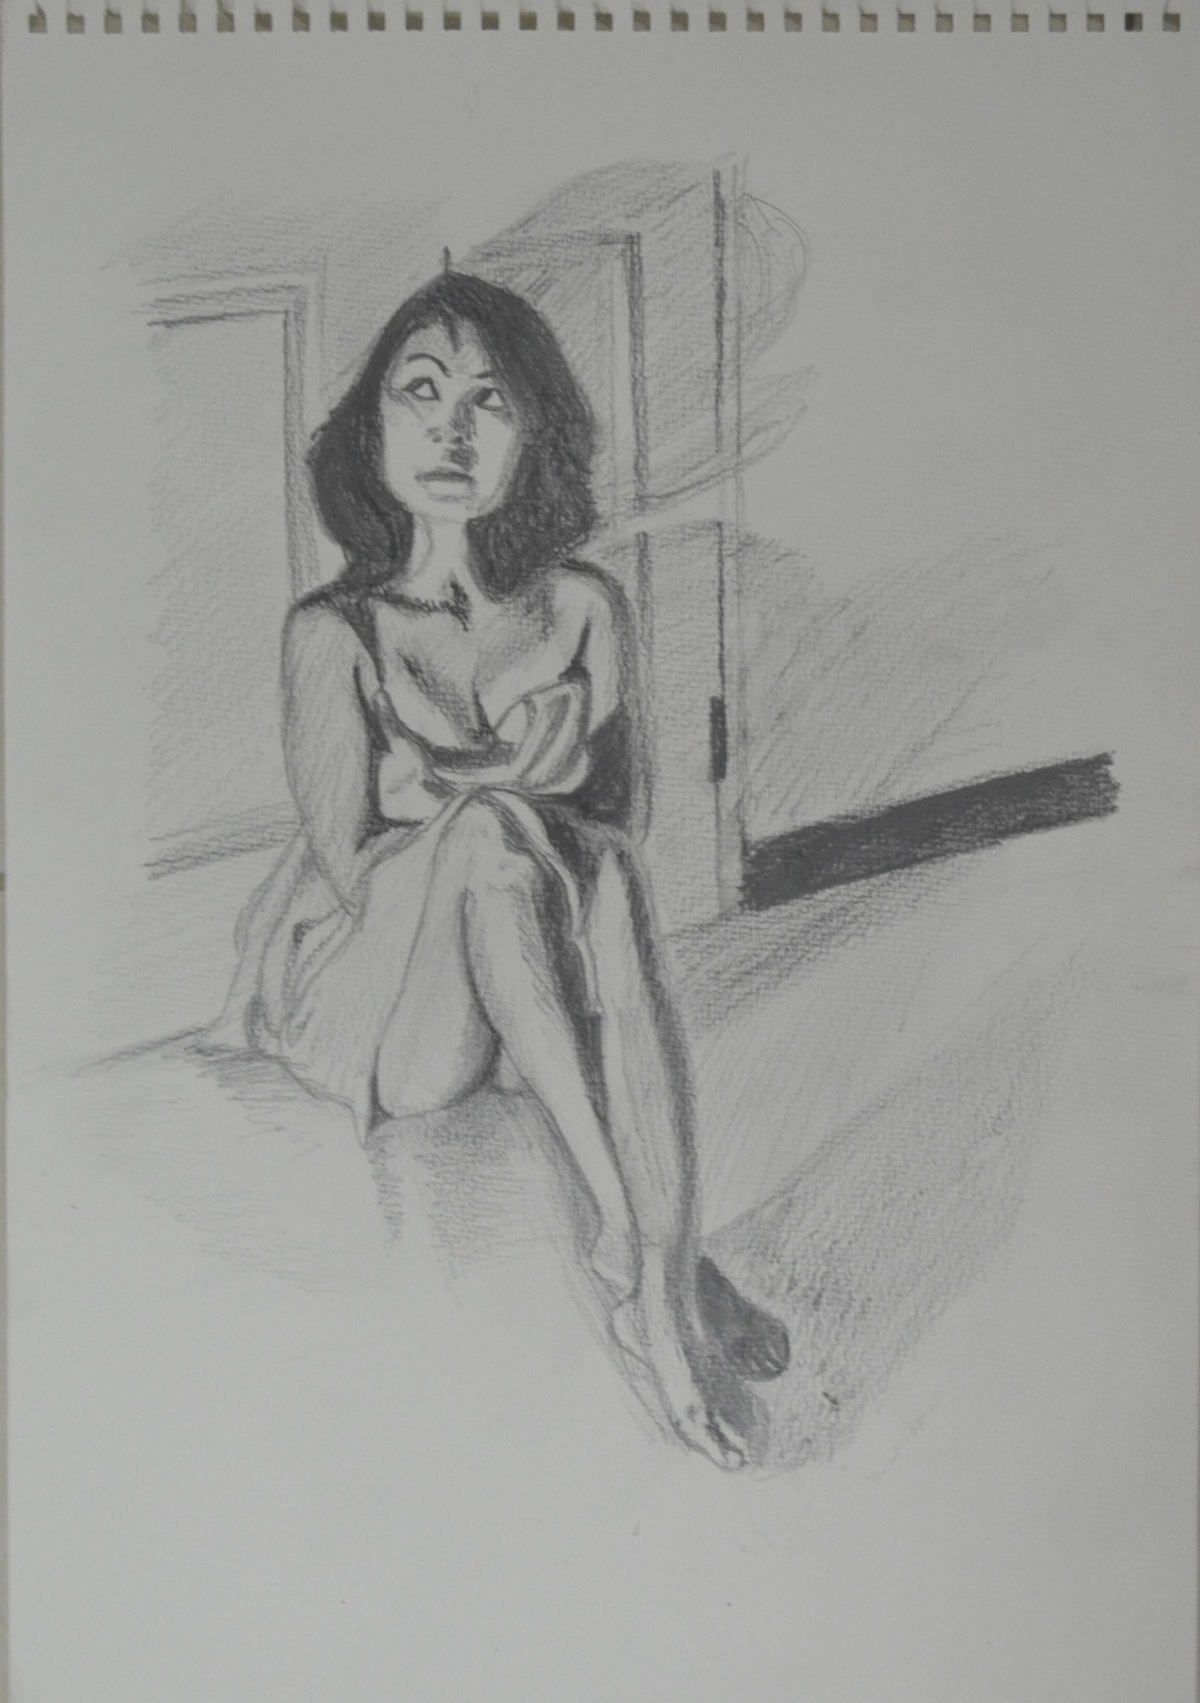 8 - WaterSoluble Pencil Sketch with Door Handle